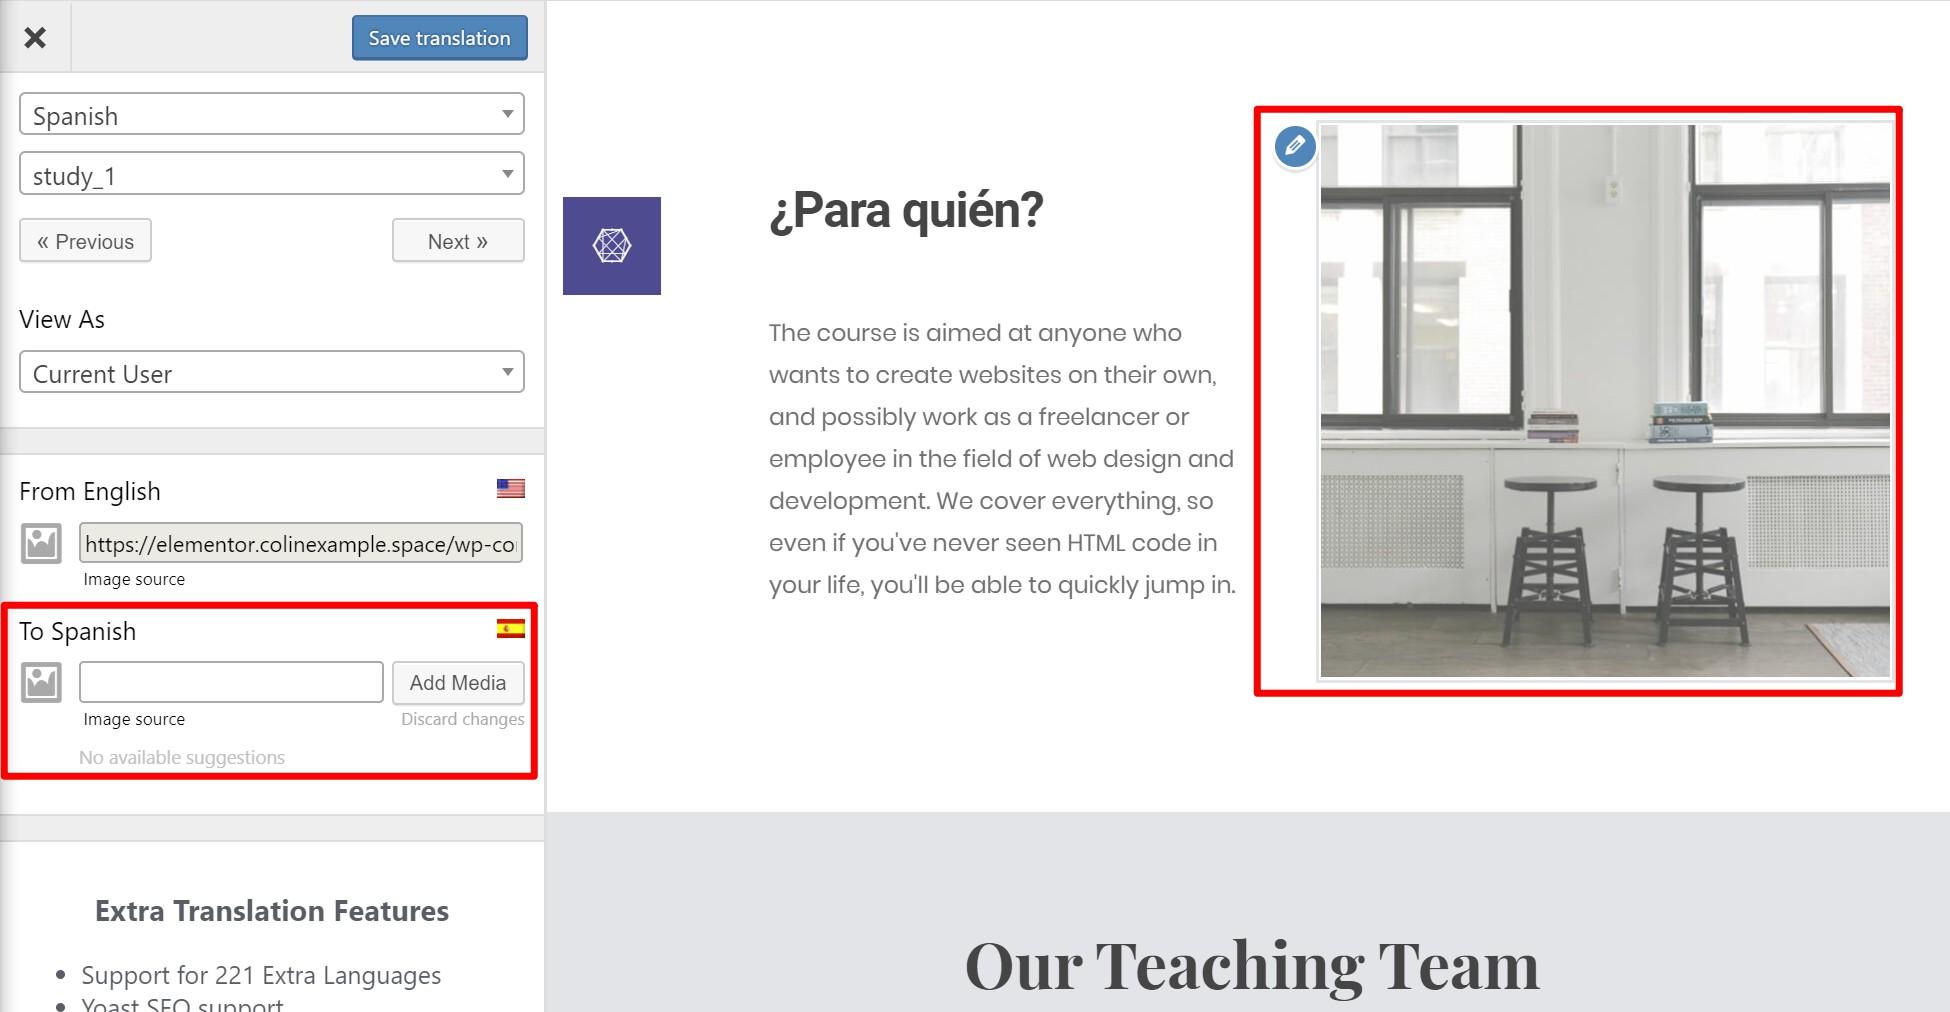 Translate Elementor image on site